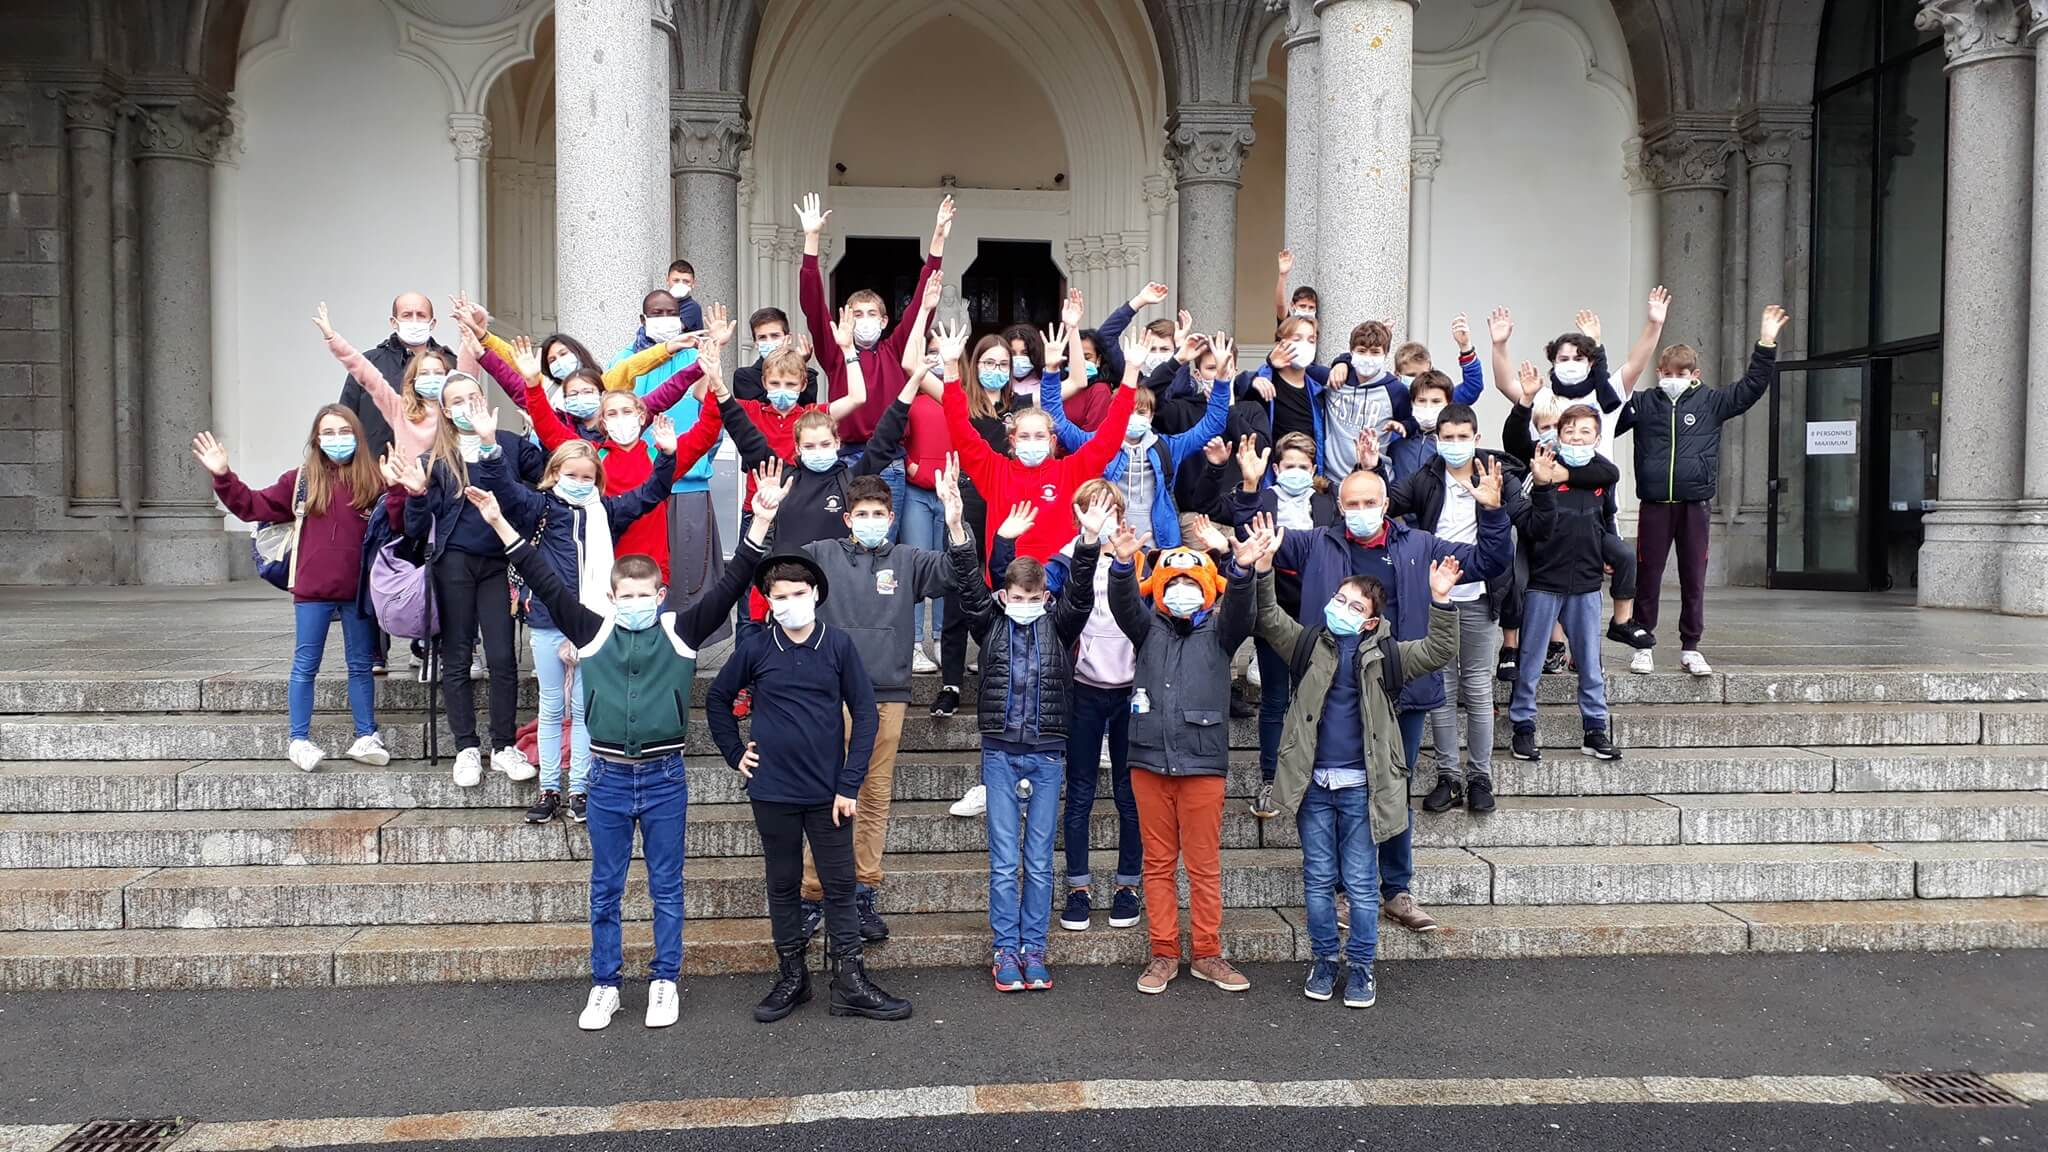 Saint-Denis International School